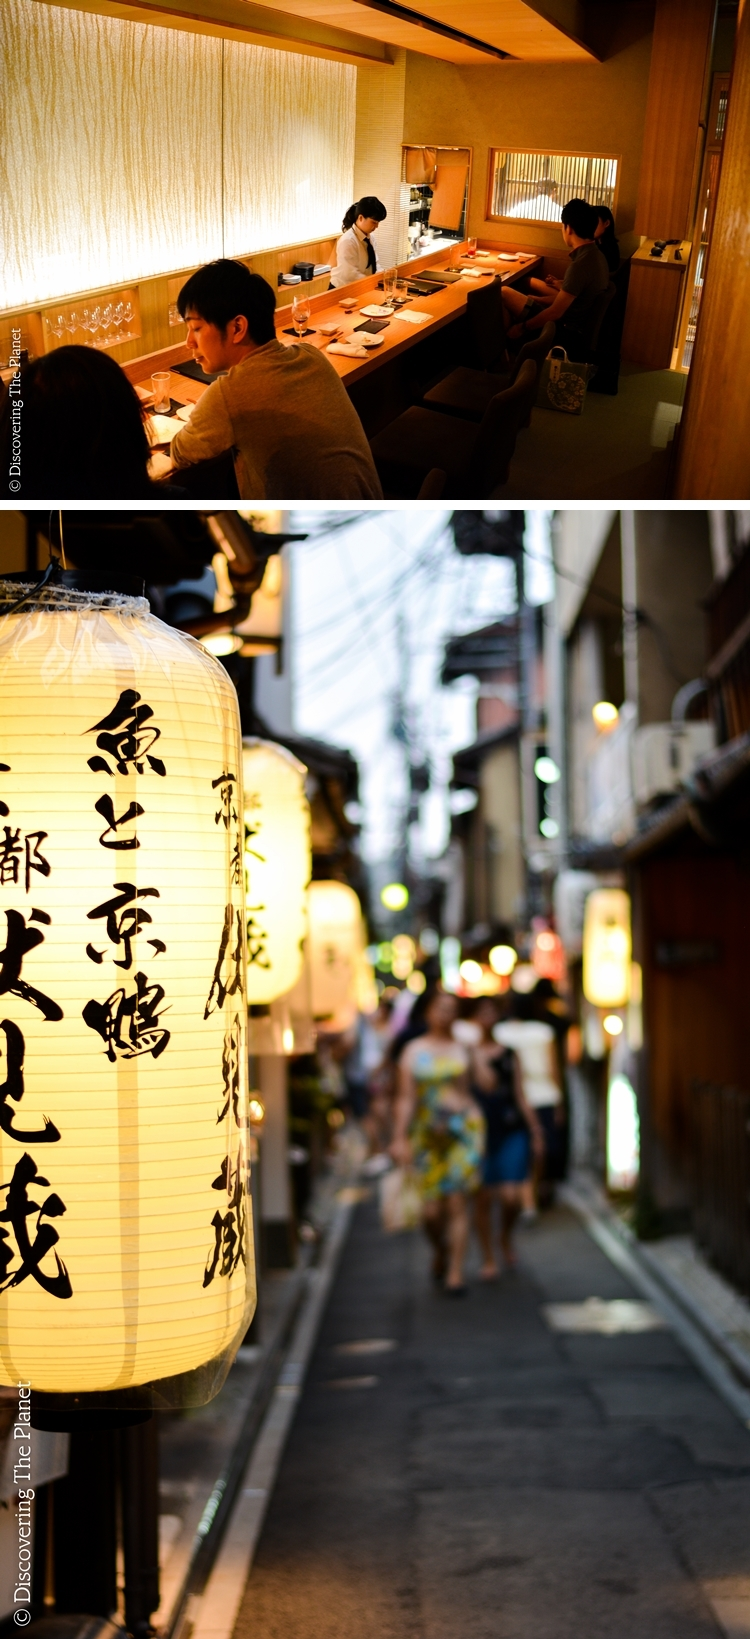 Japan, Kyoto, Gion 10